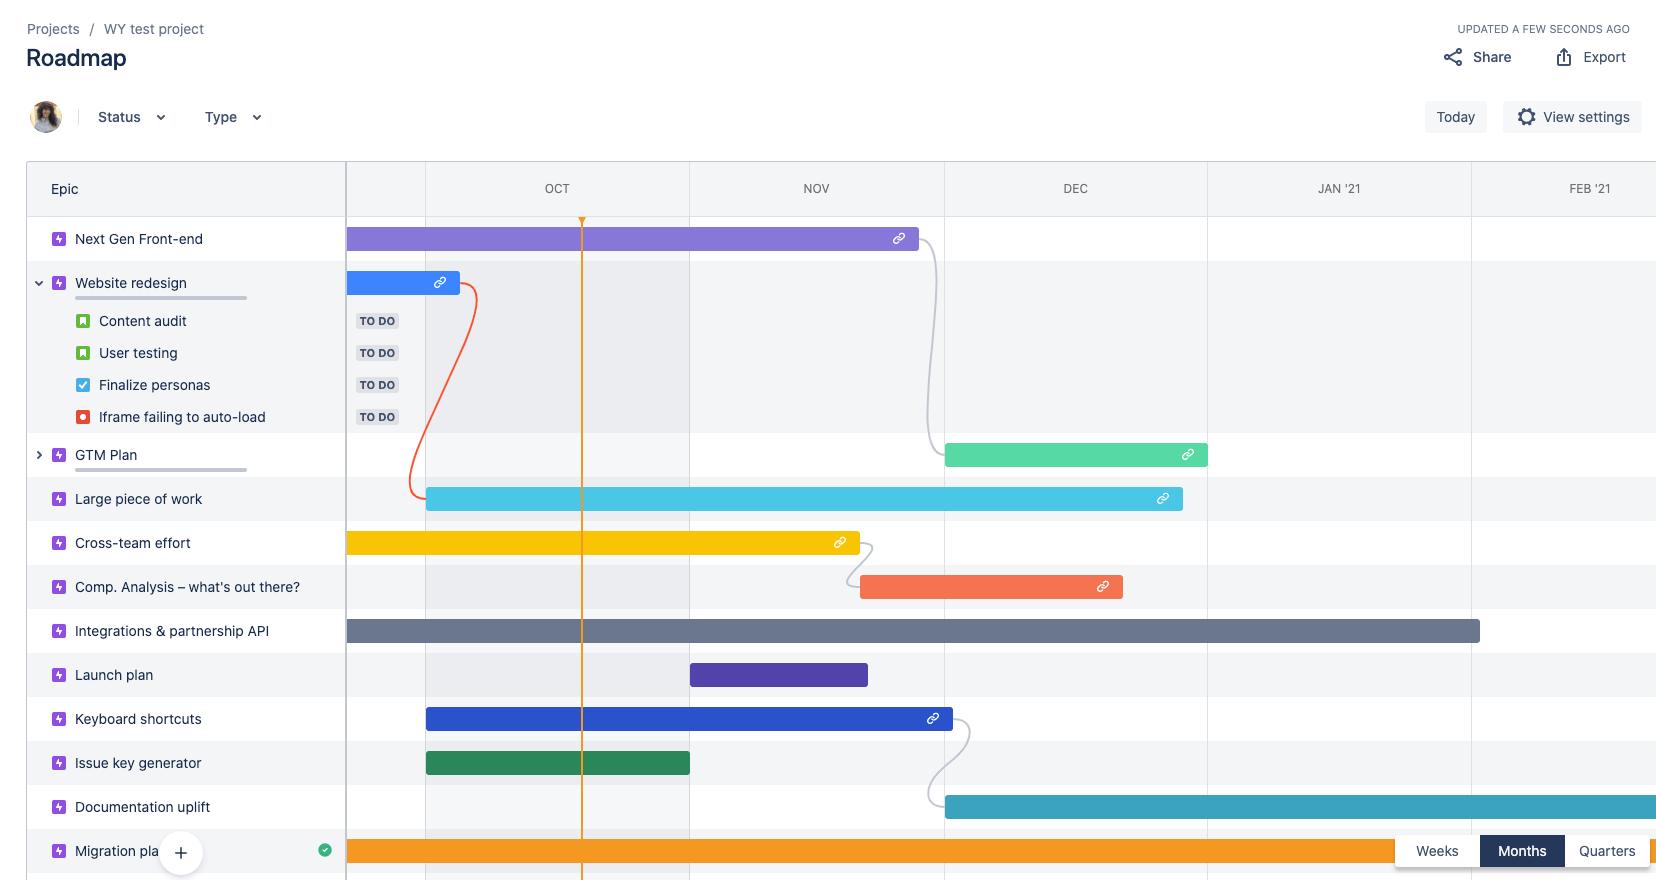 Basic Roadmap view in Jira Software